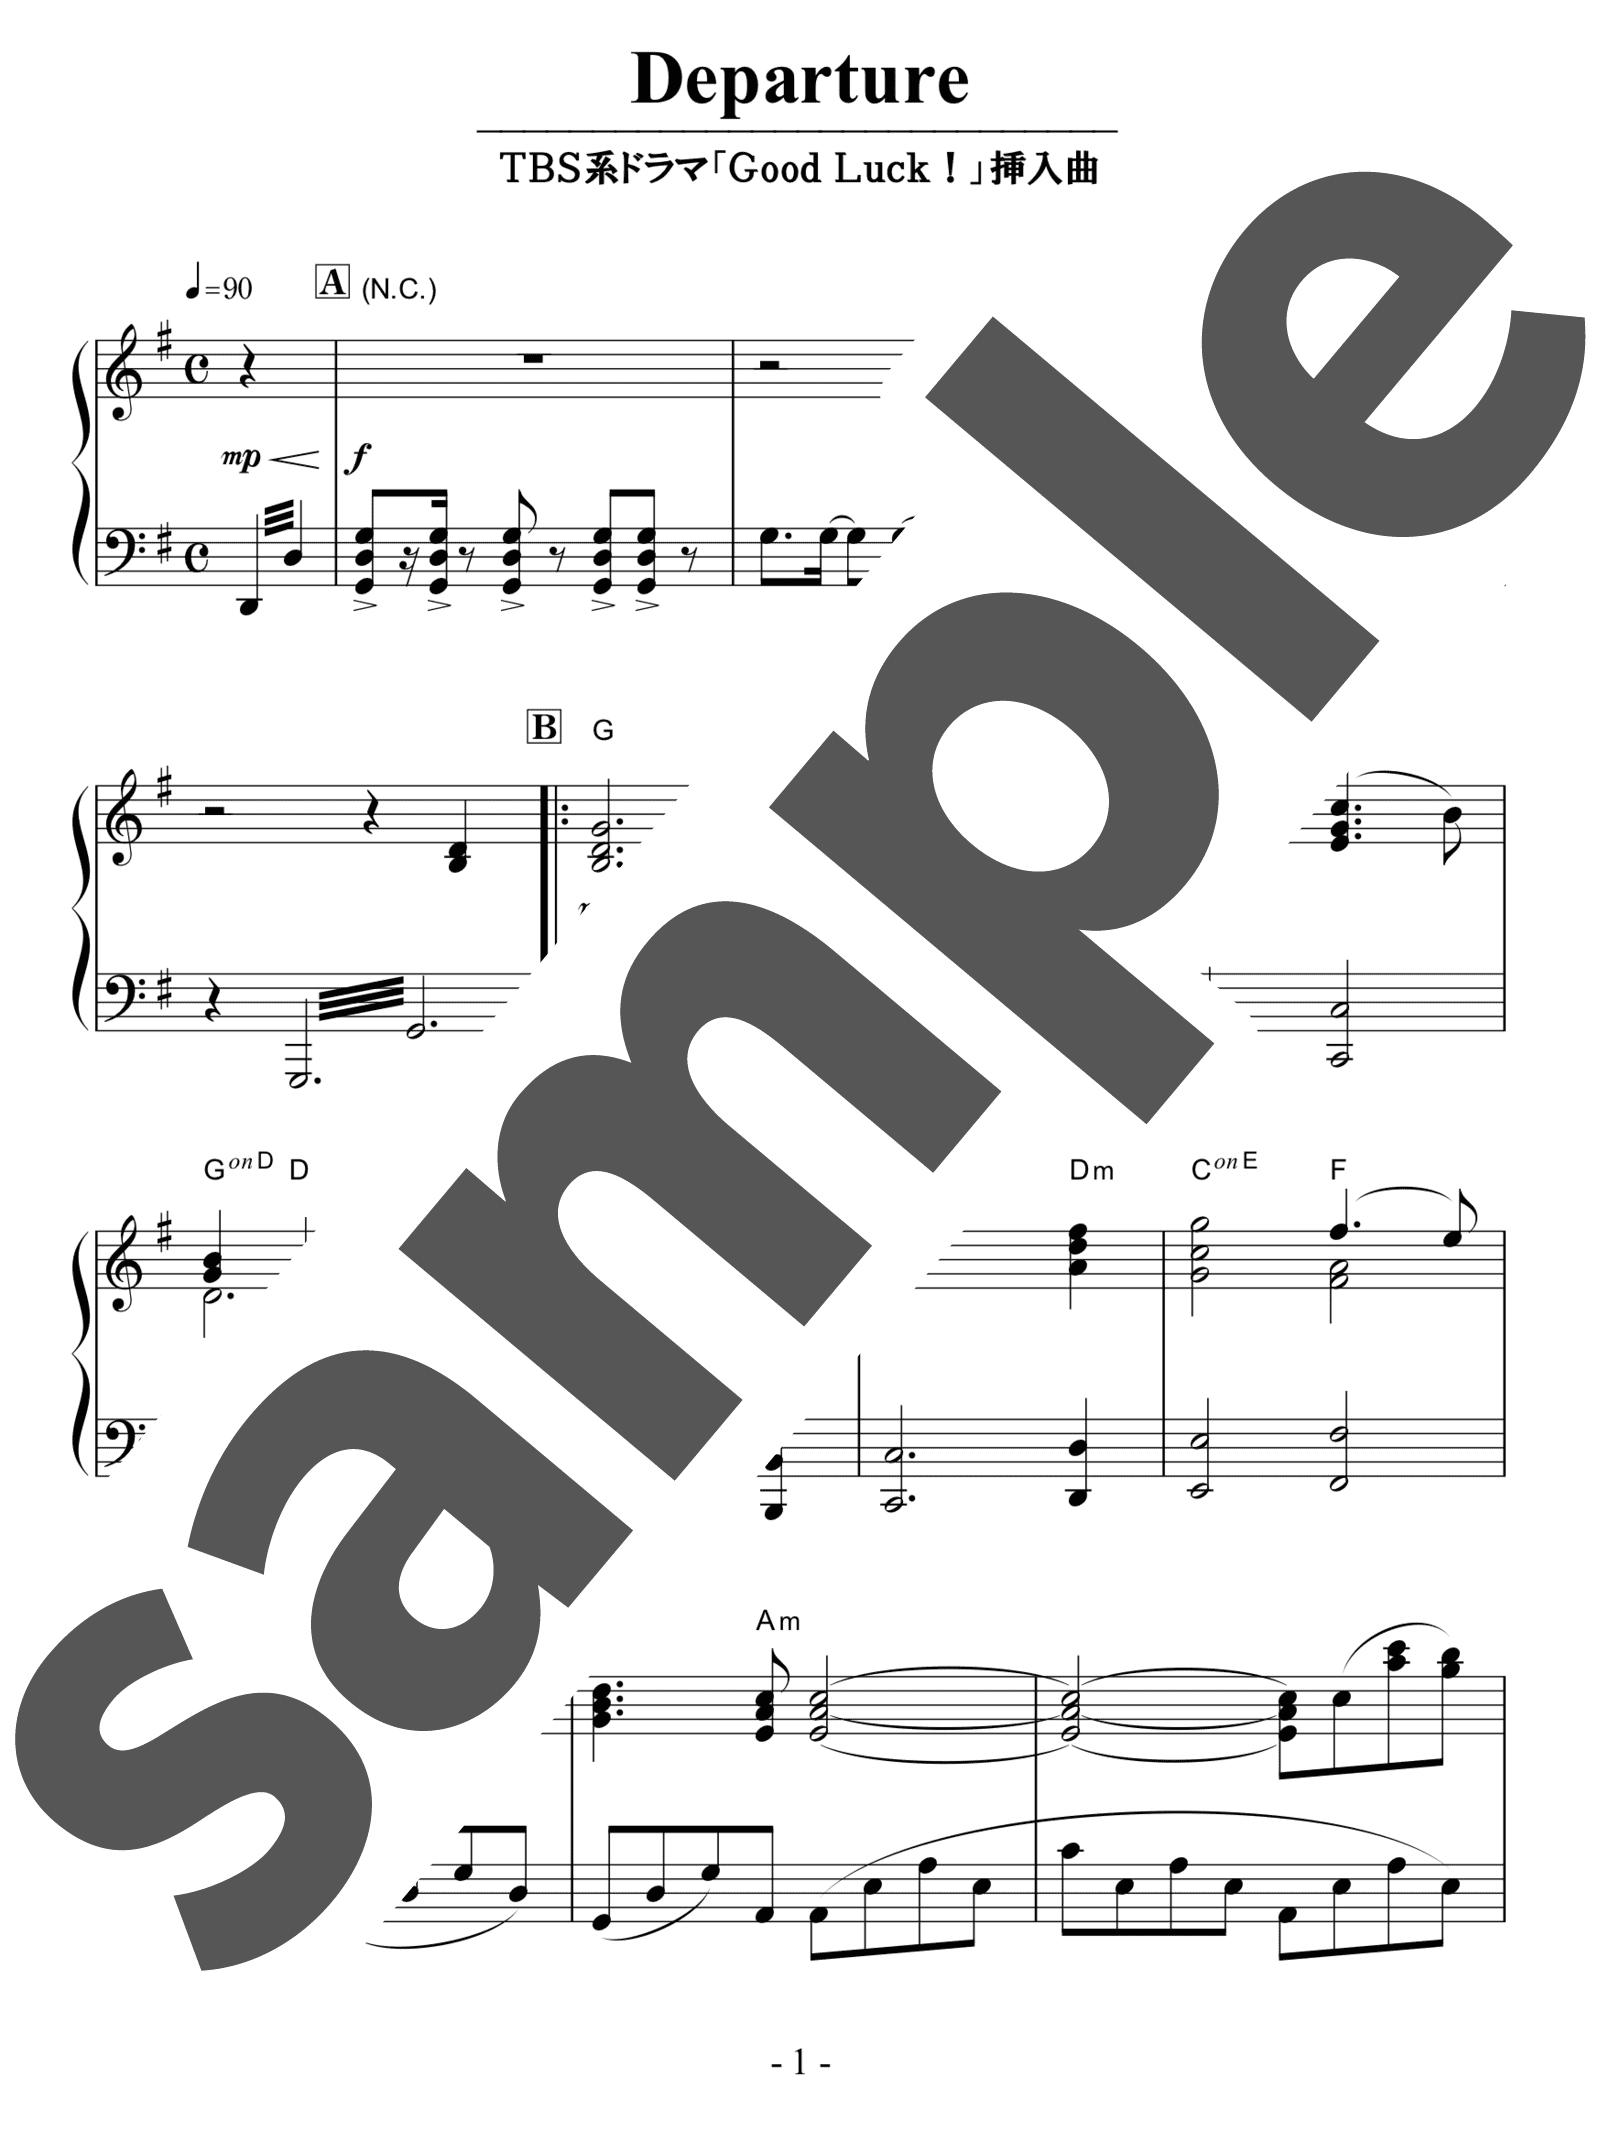 「DEPARTURE」のサンプル楽譜